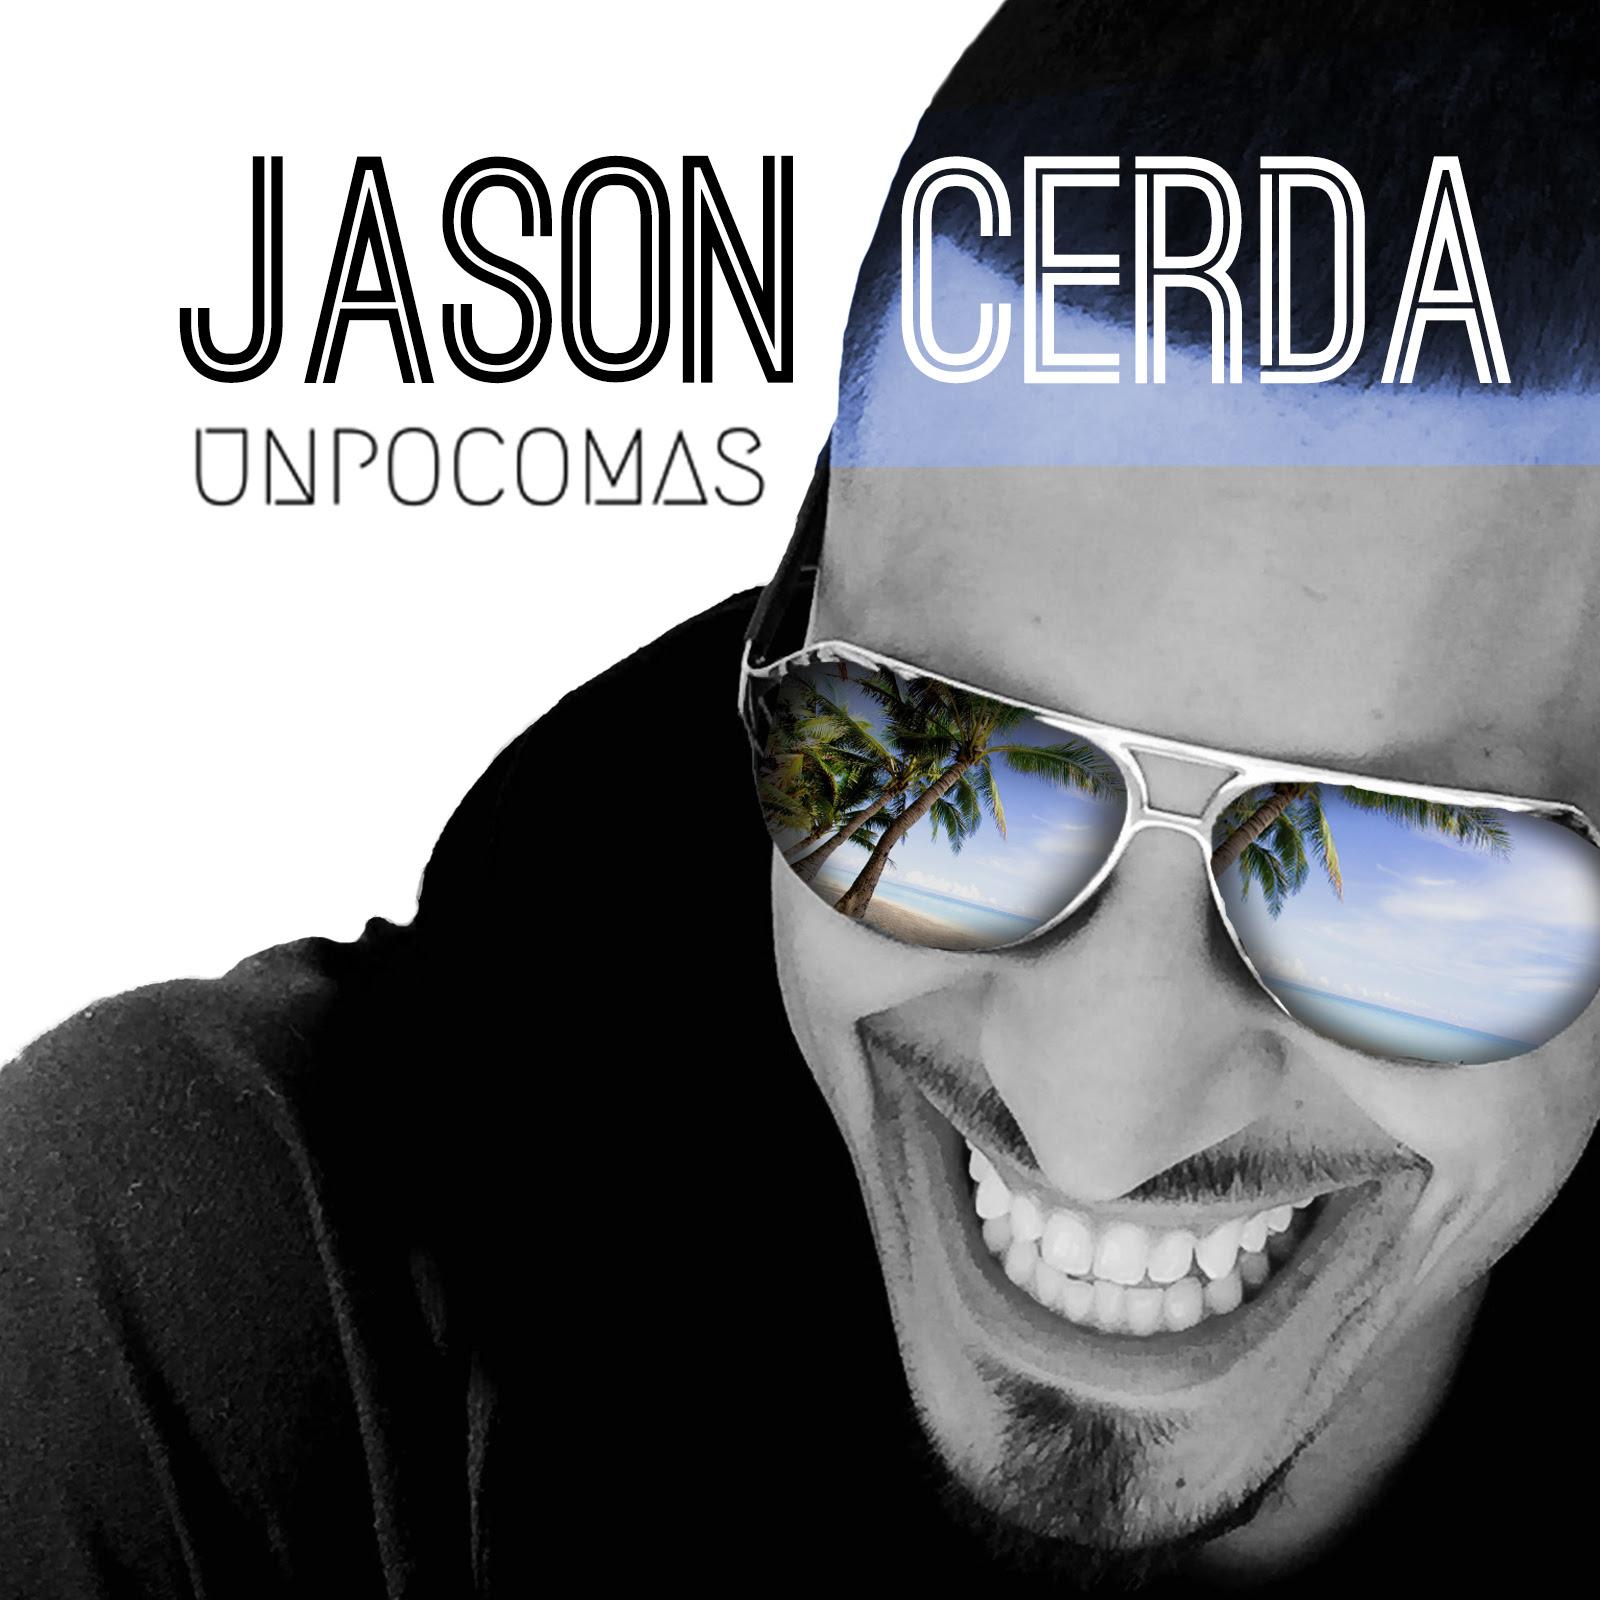 Jason Cerda